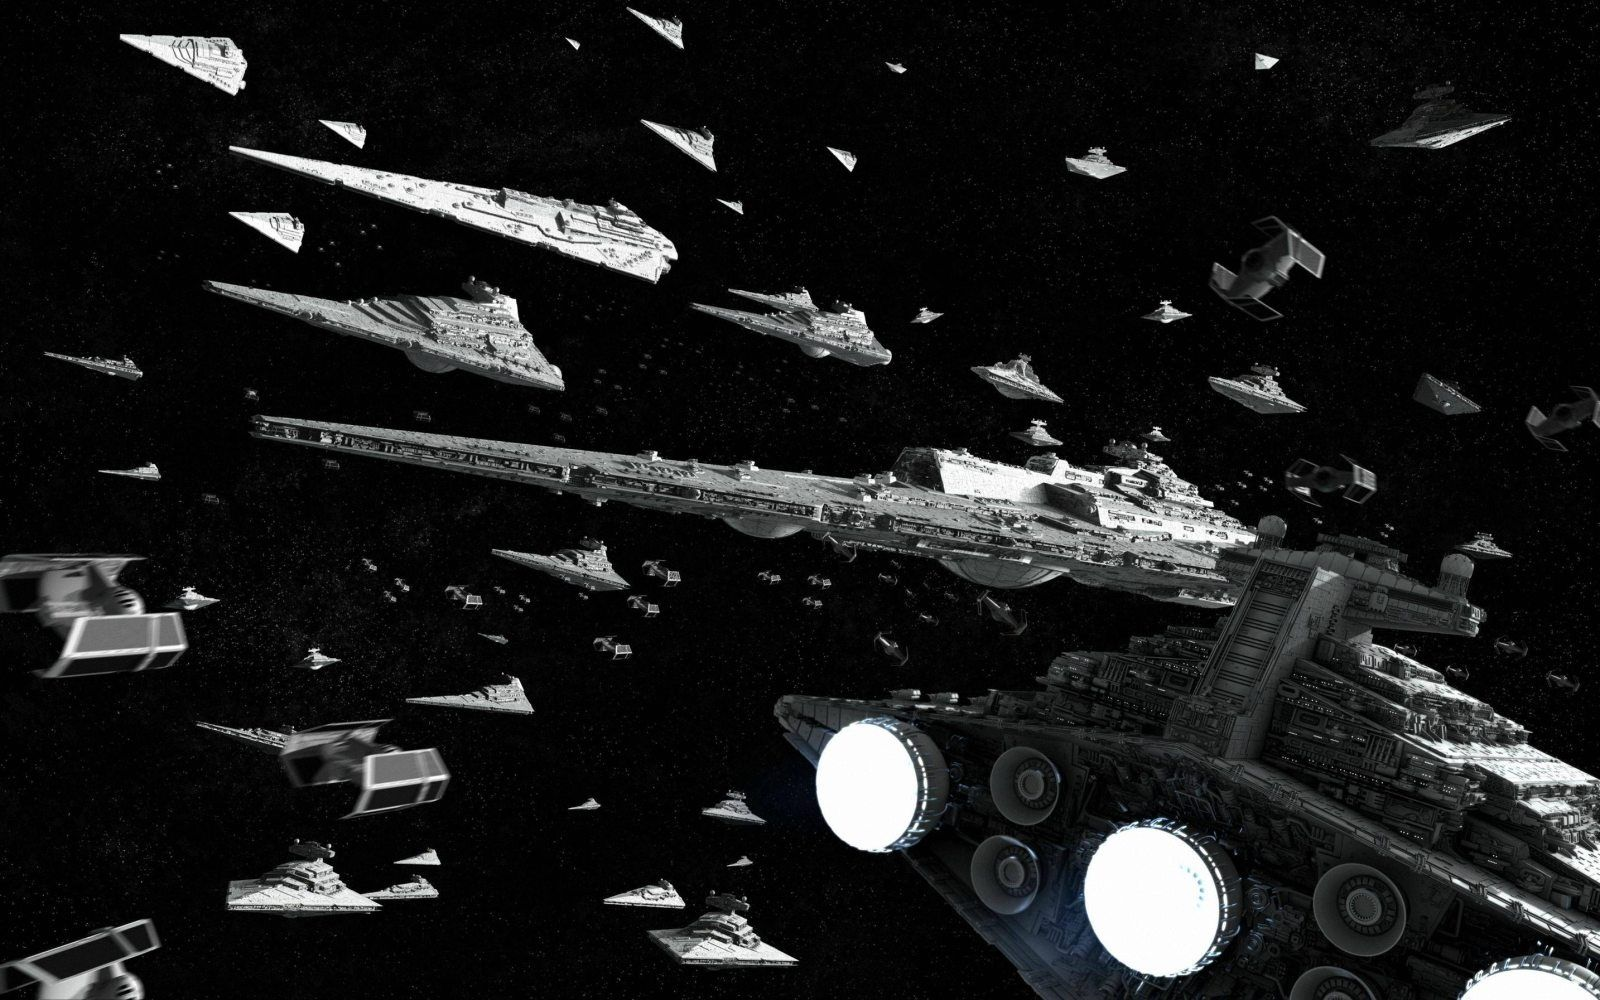 cool star wars wallpaper old school star wars geek